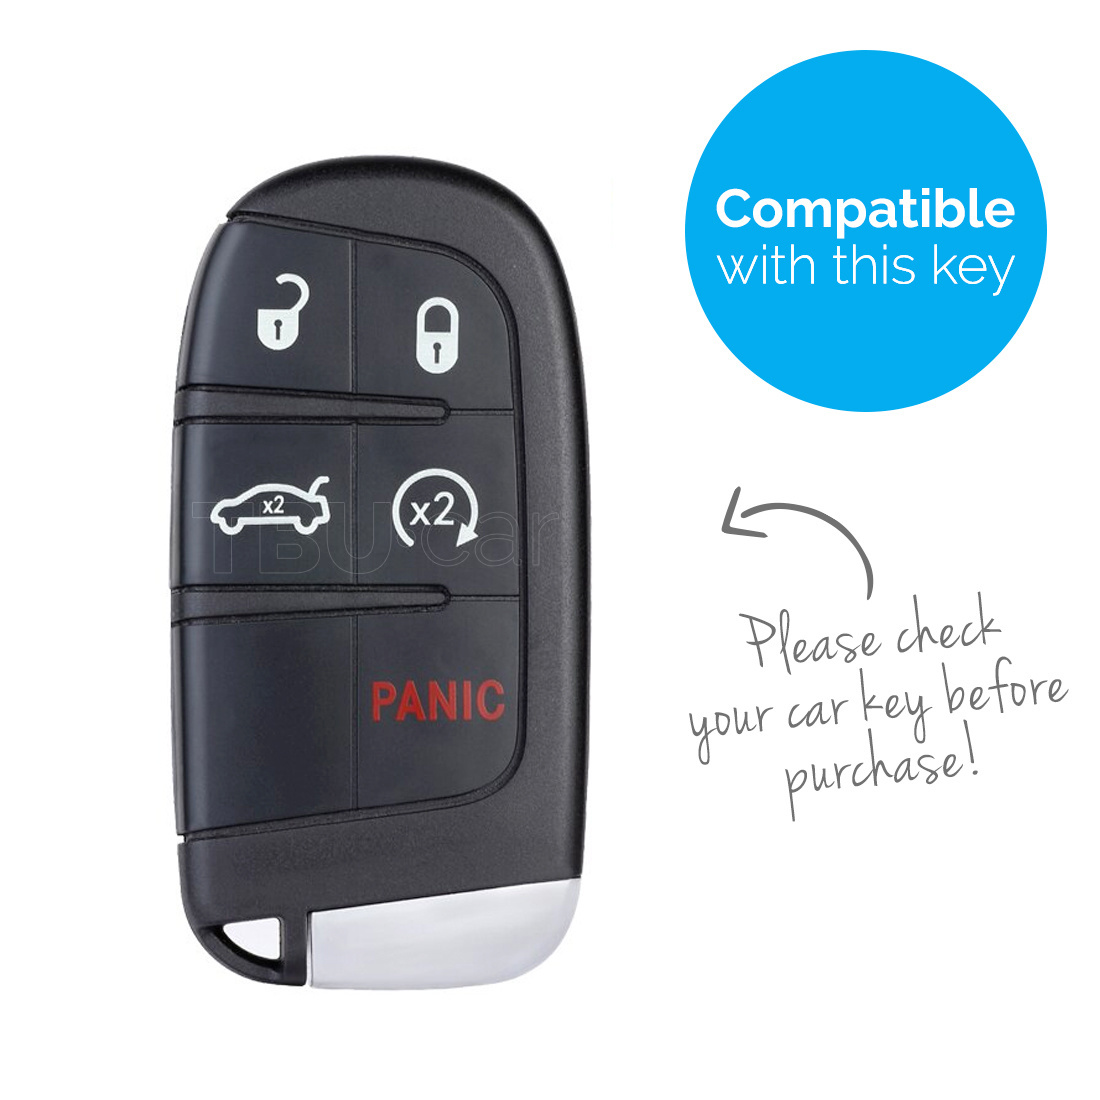 TBU car TBU car Autoschlüssel Hülle kompatibel mit Fiat 5 Tasten (Keyless Entry) - Schutzhülle aus TPU - Auto Schlüsselhülle Cover in Roségold